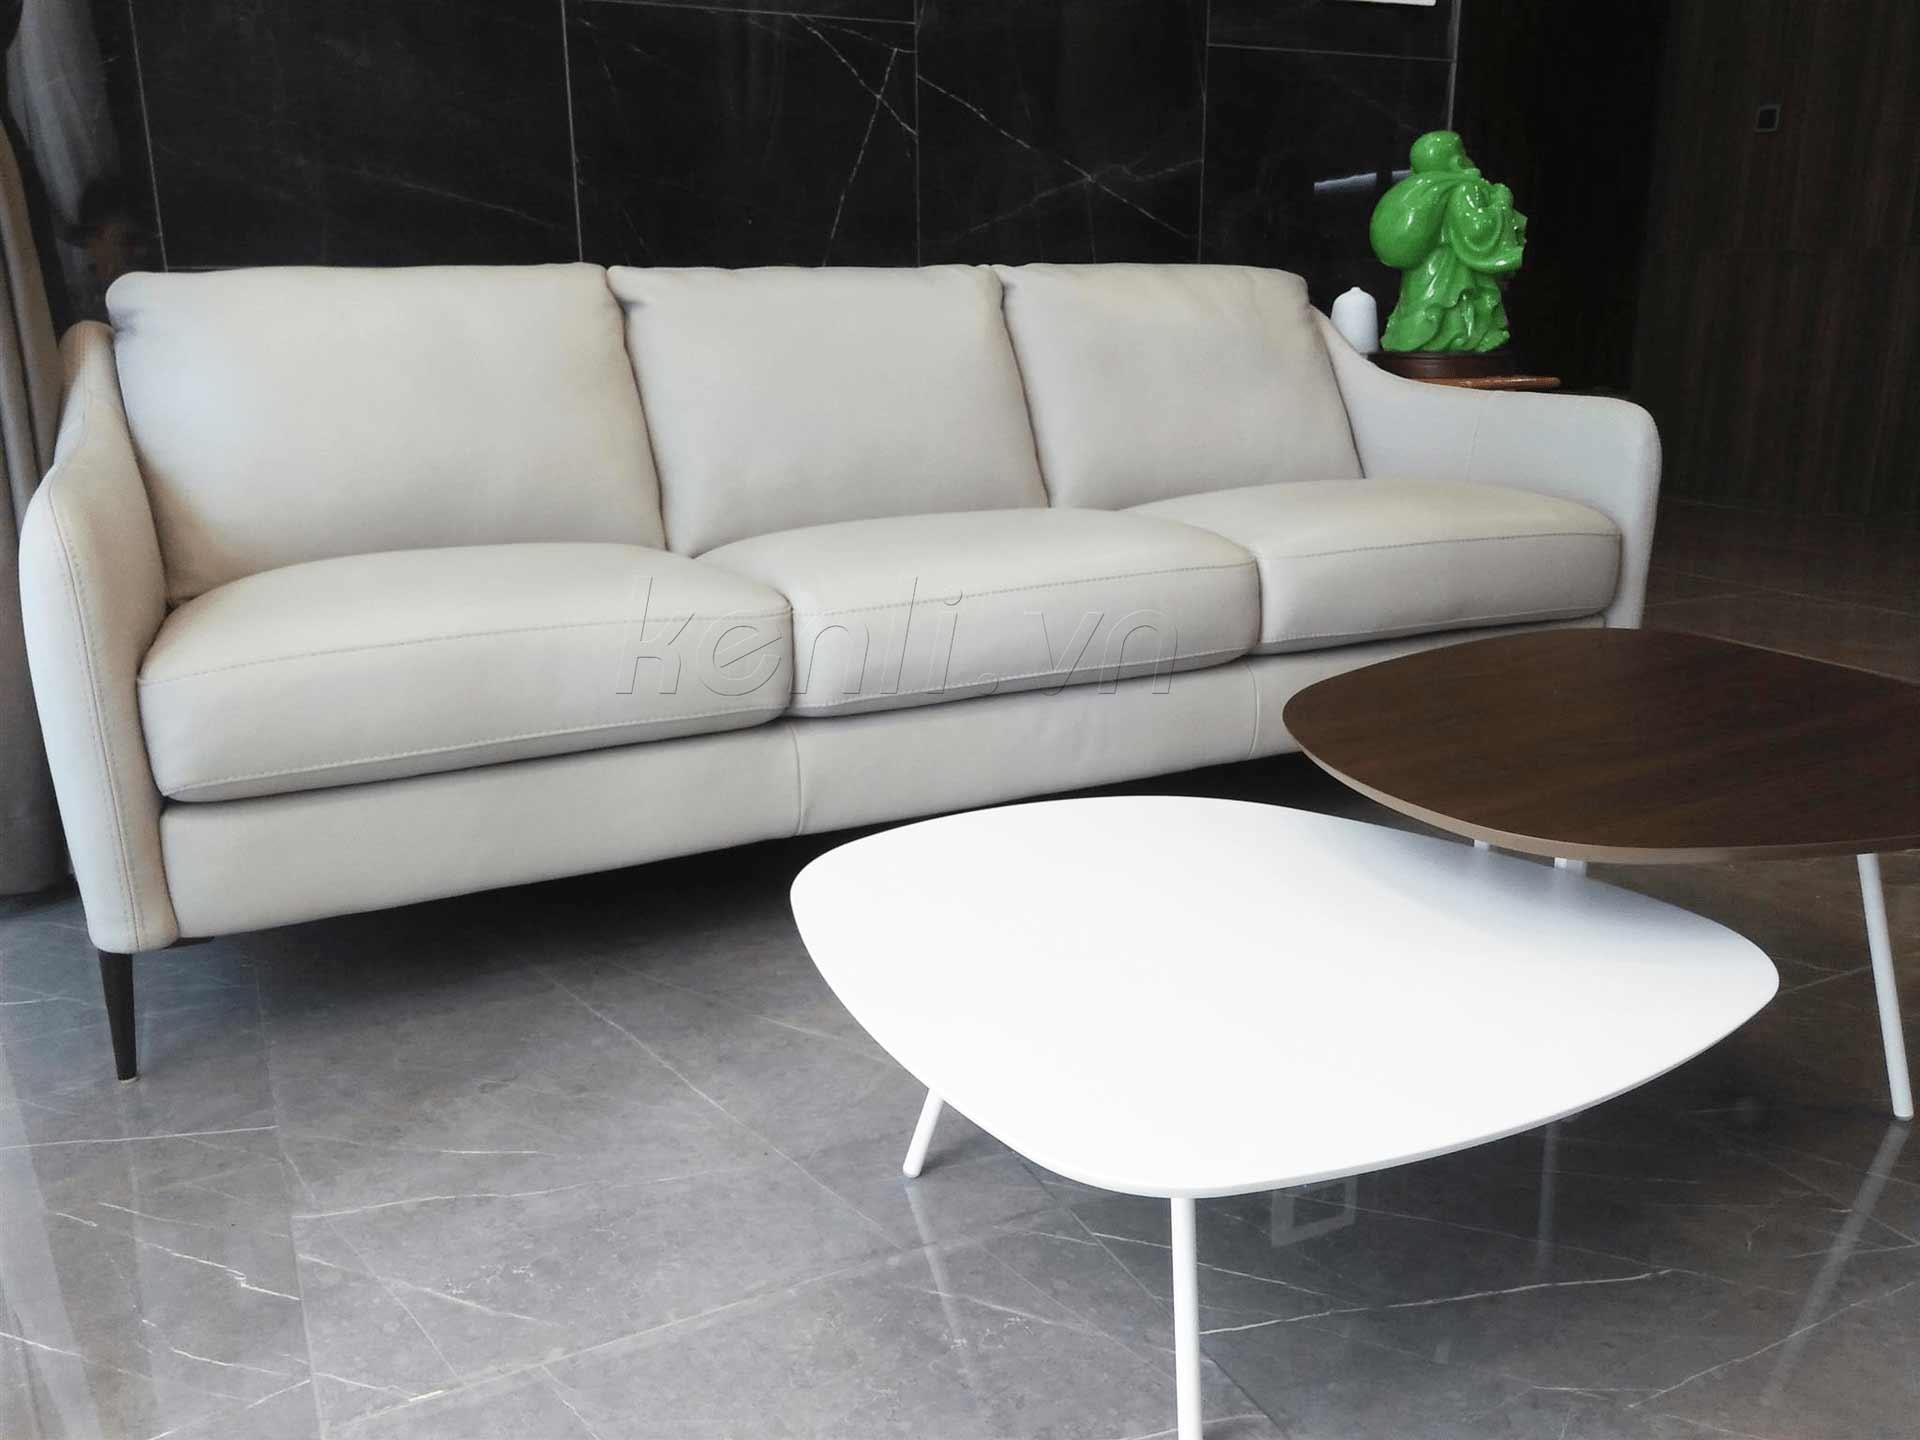 Sofa da thật E130 full bộ11